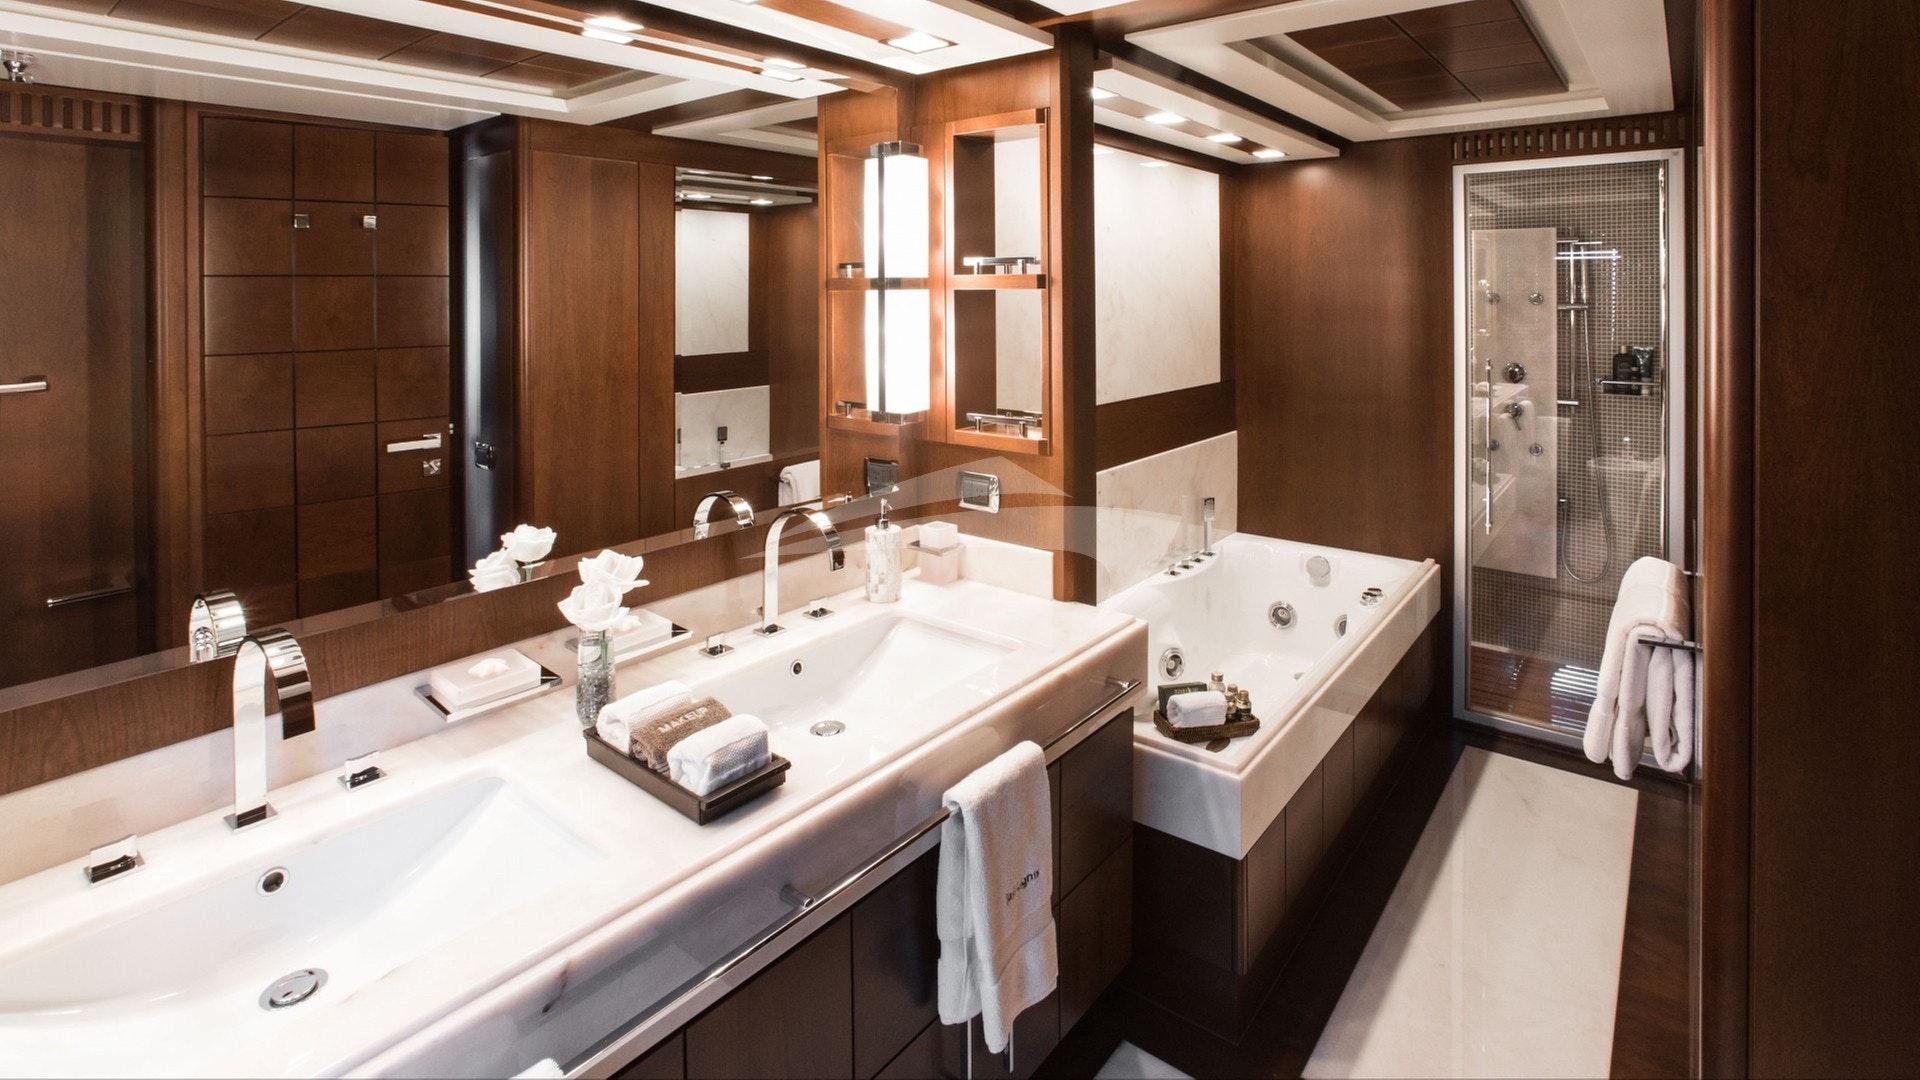 Master En suite w/ Jacuzzi Tub and Jet Shower